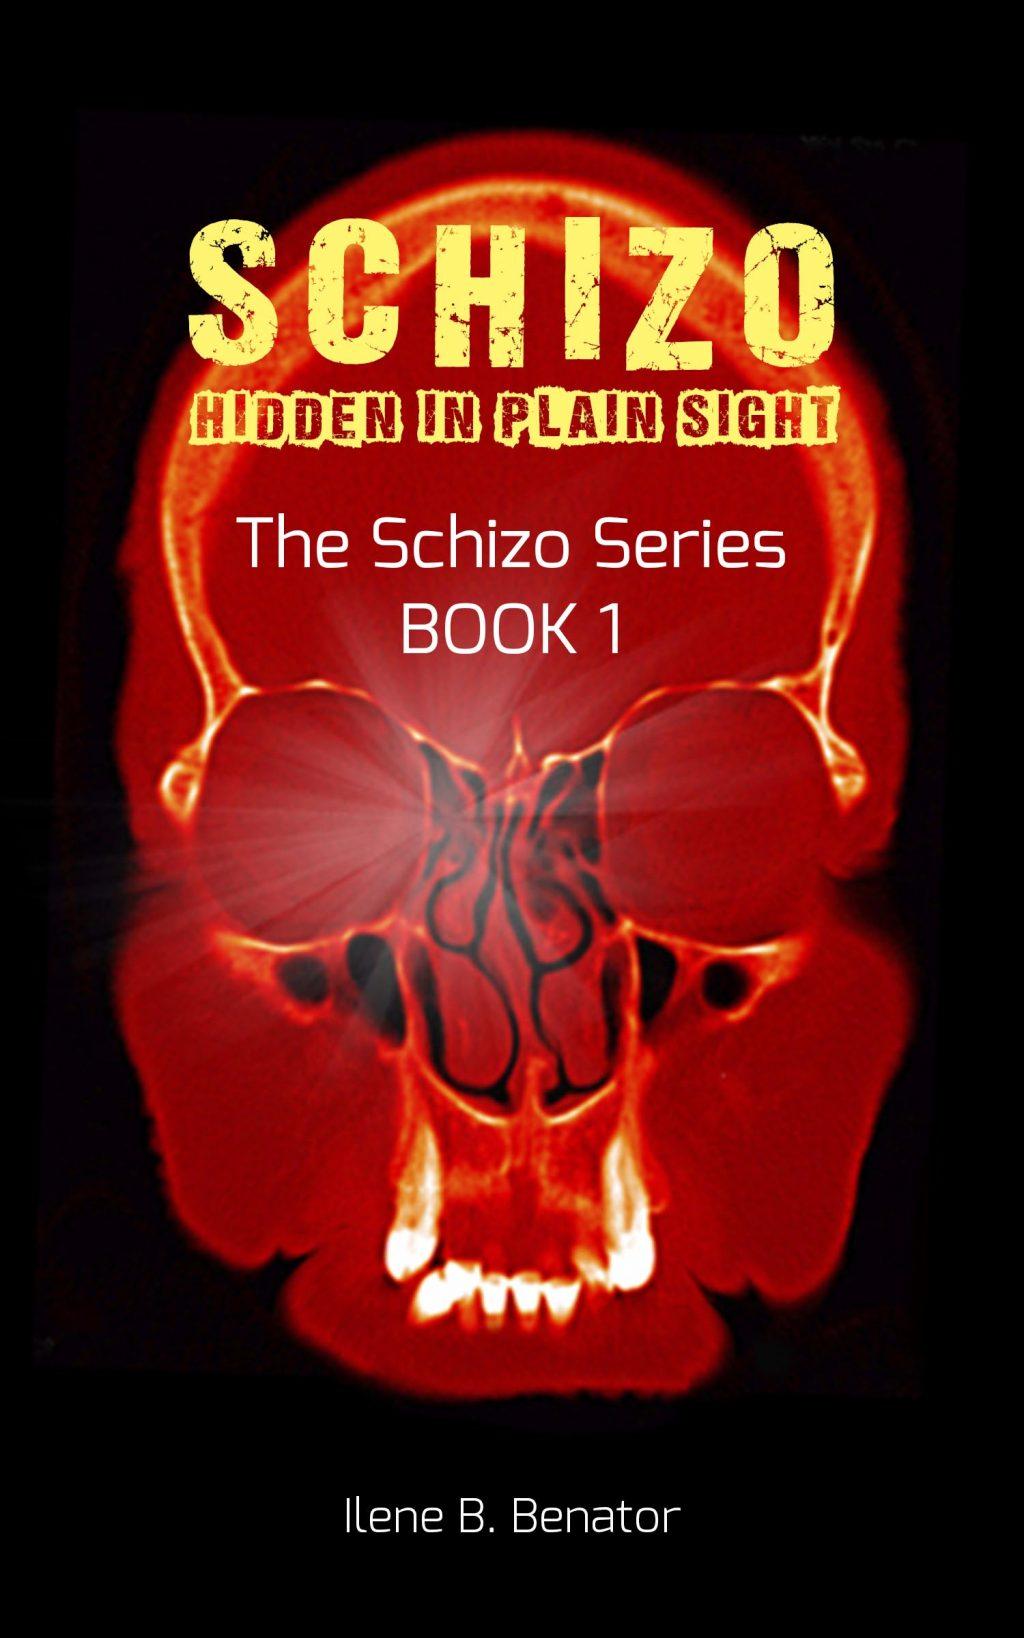 Schizo: Hidden in Plain Sight By Ilene B. Benator